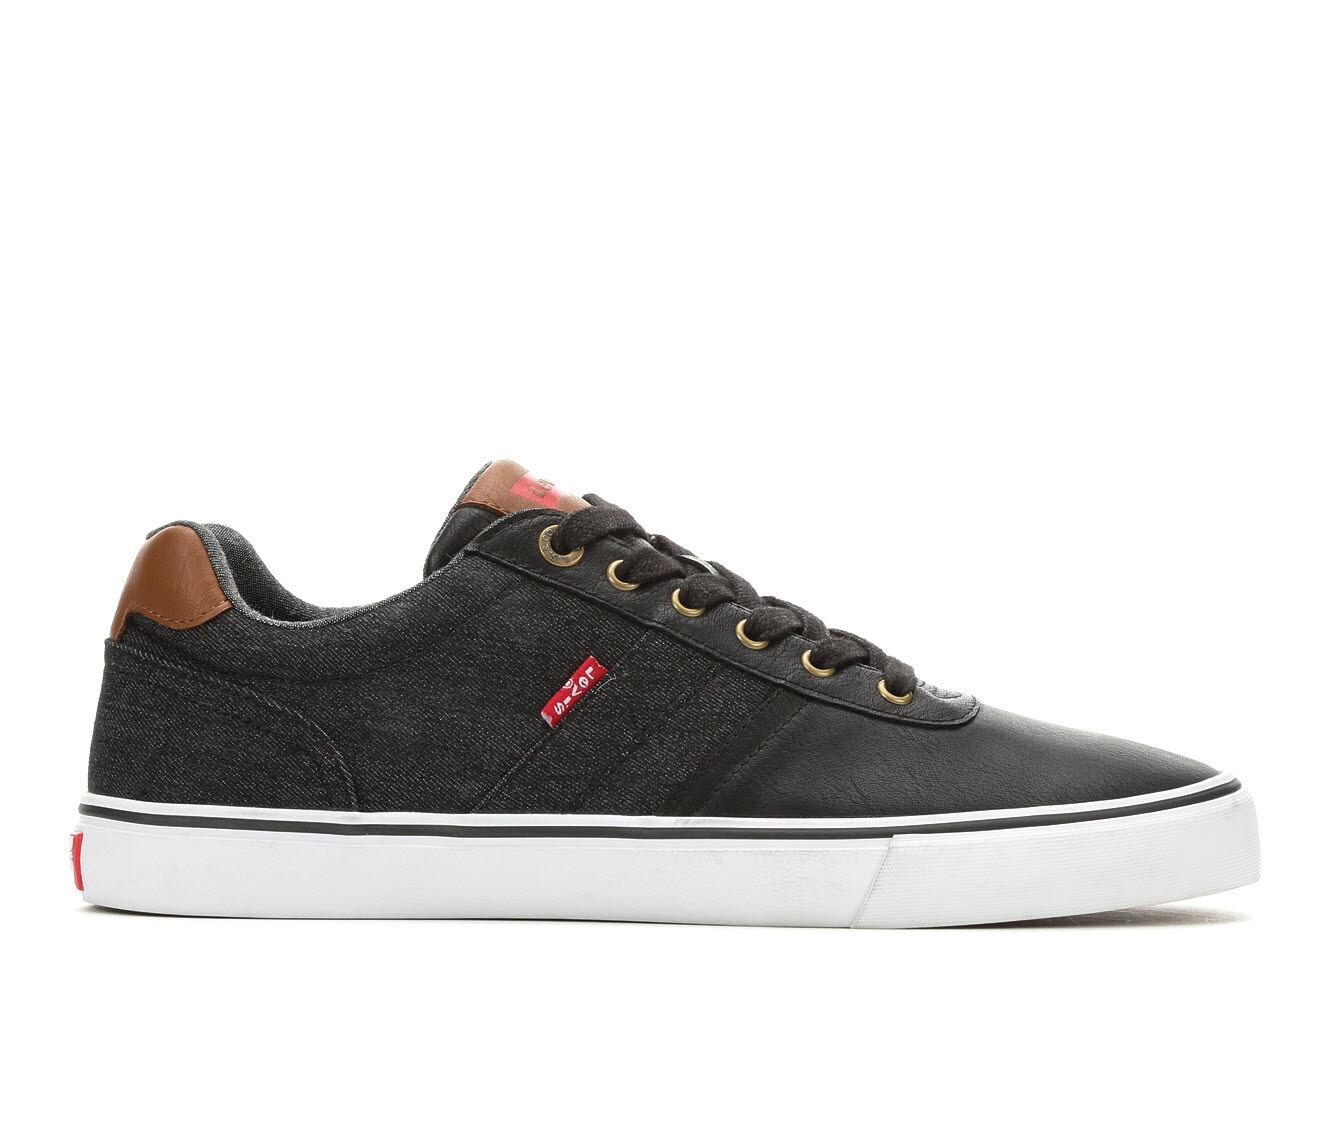 summer offer Men's Levis Miles Cacti Denim Casual Shoes Black